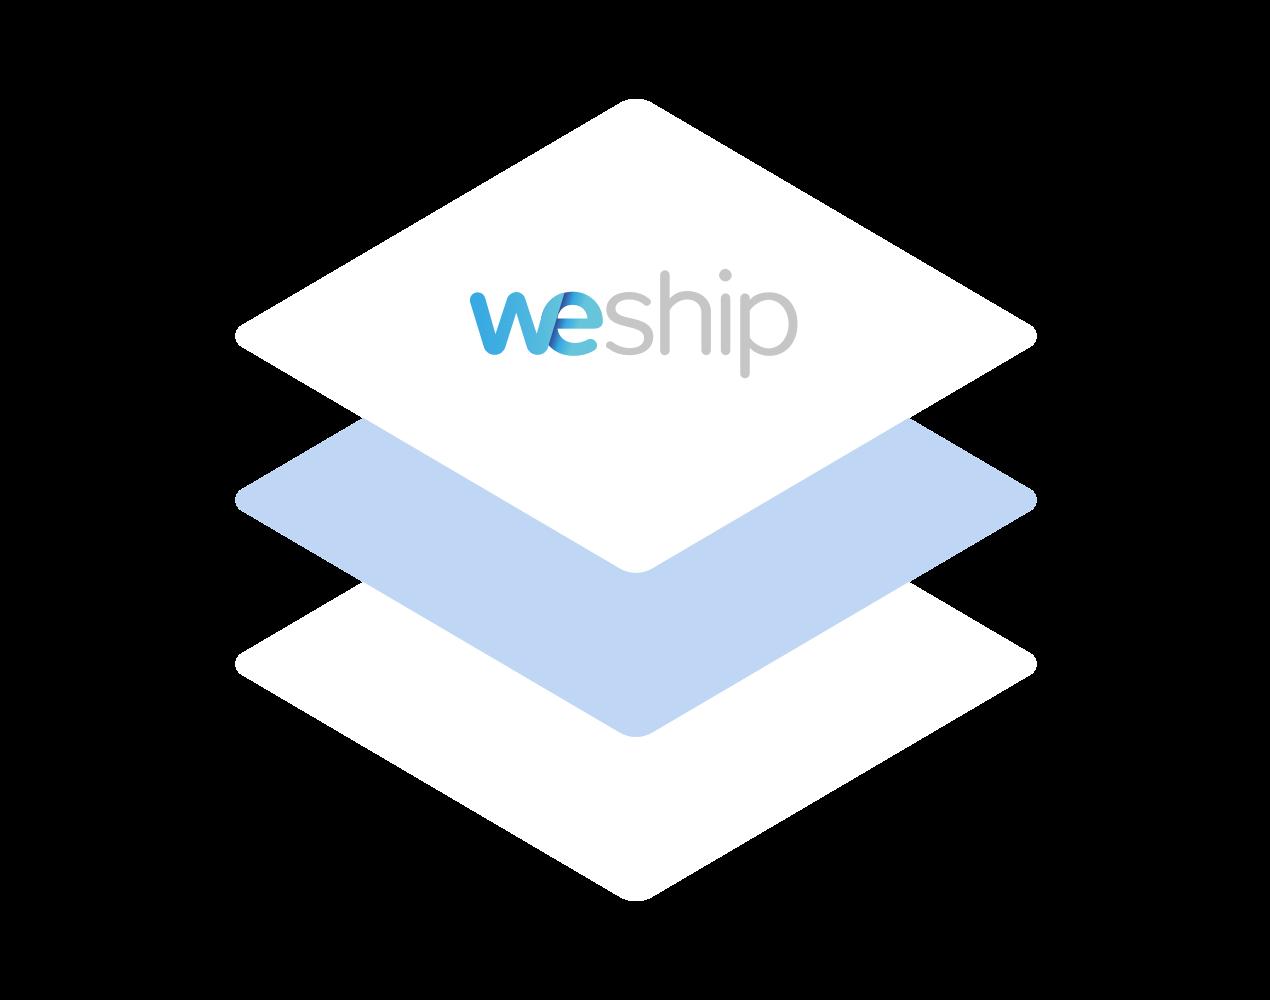 assets::weship-logo@2x.png